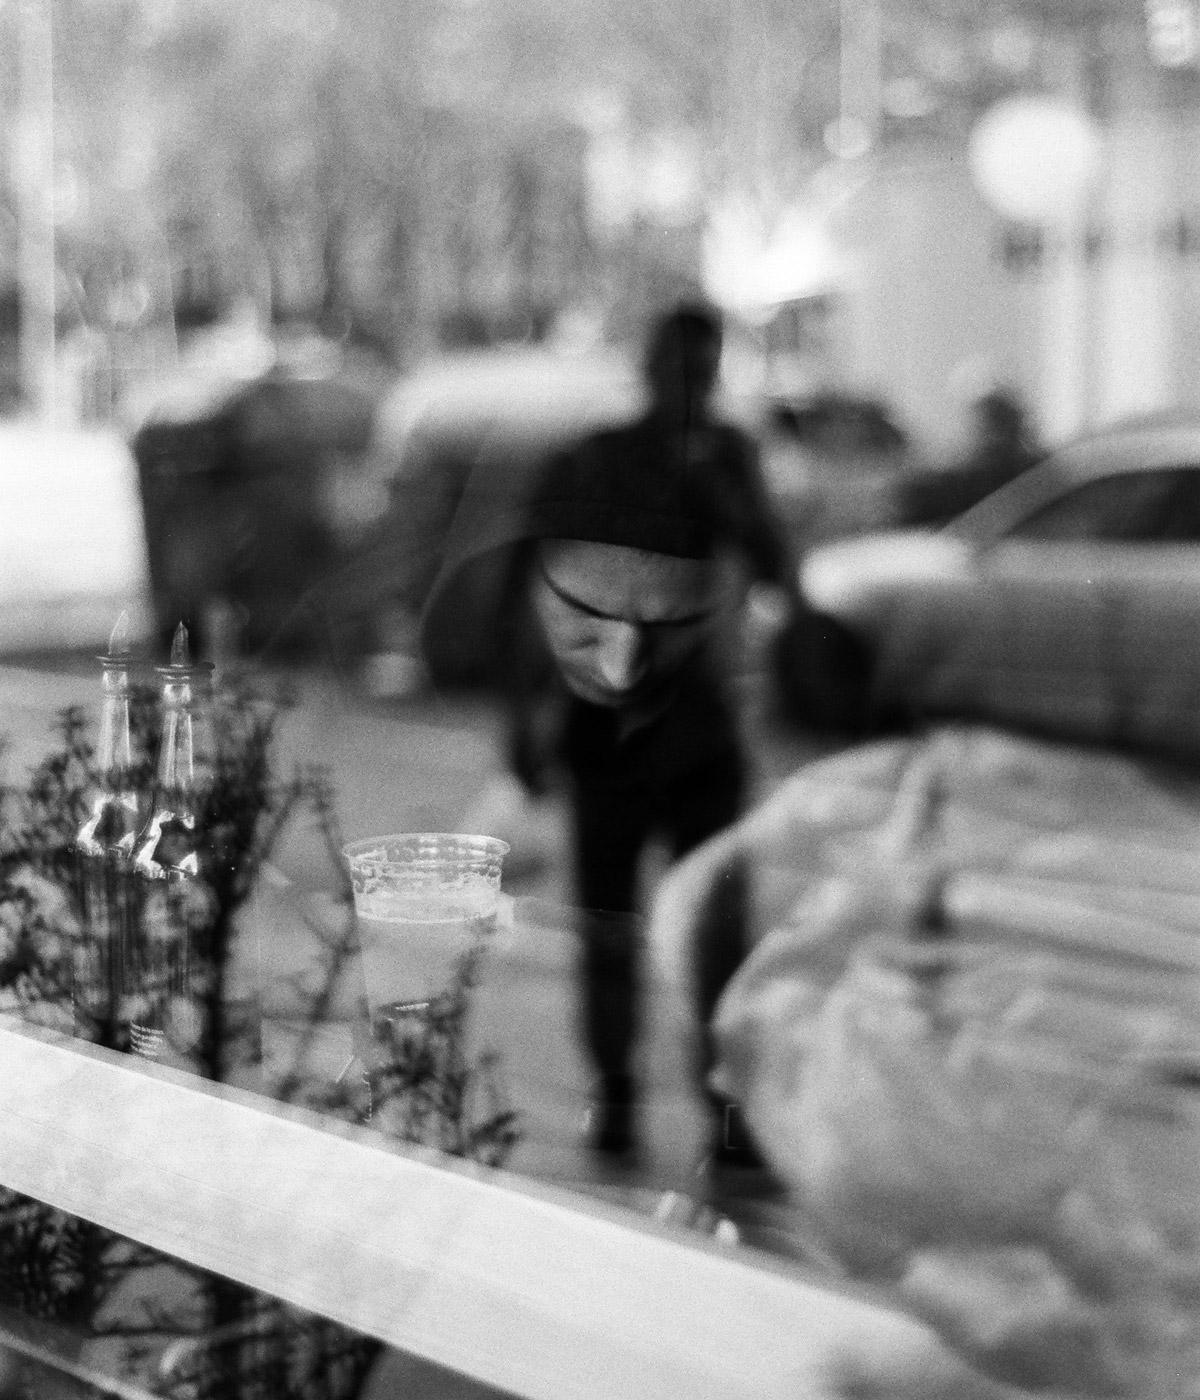 Yentl-Touboul-@yentlt-Portrait